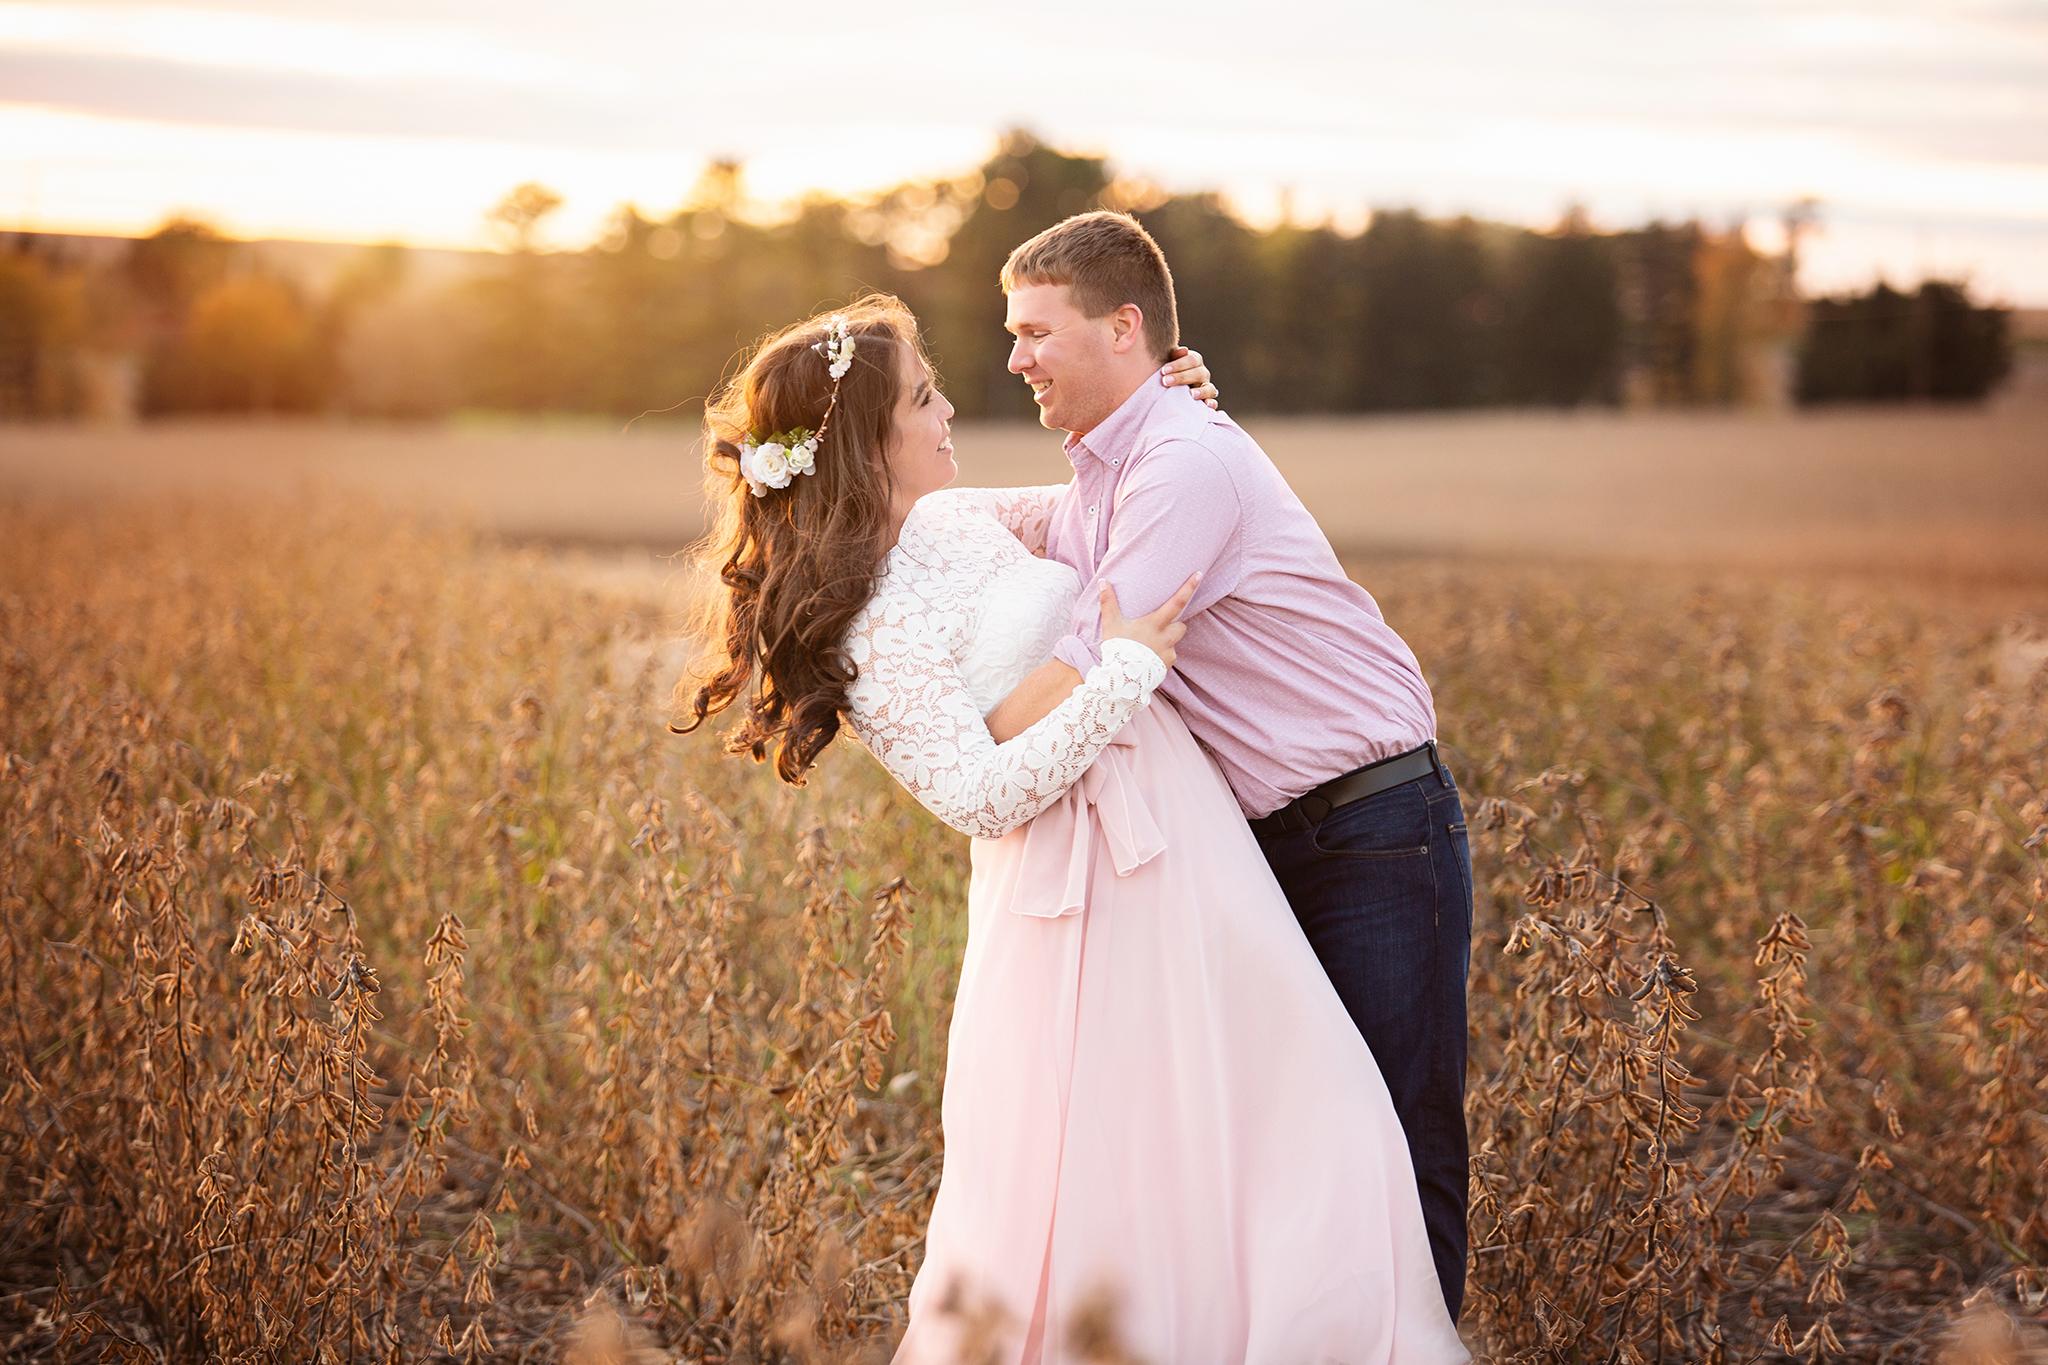 lehia erger photography engagement  wedding brandon iowa farm2.jpg